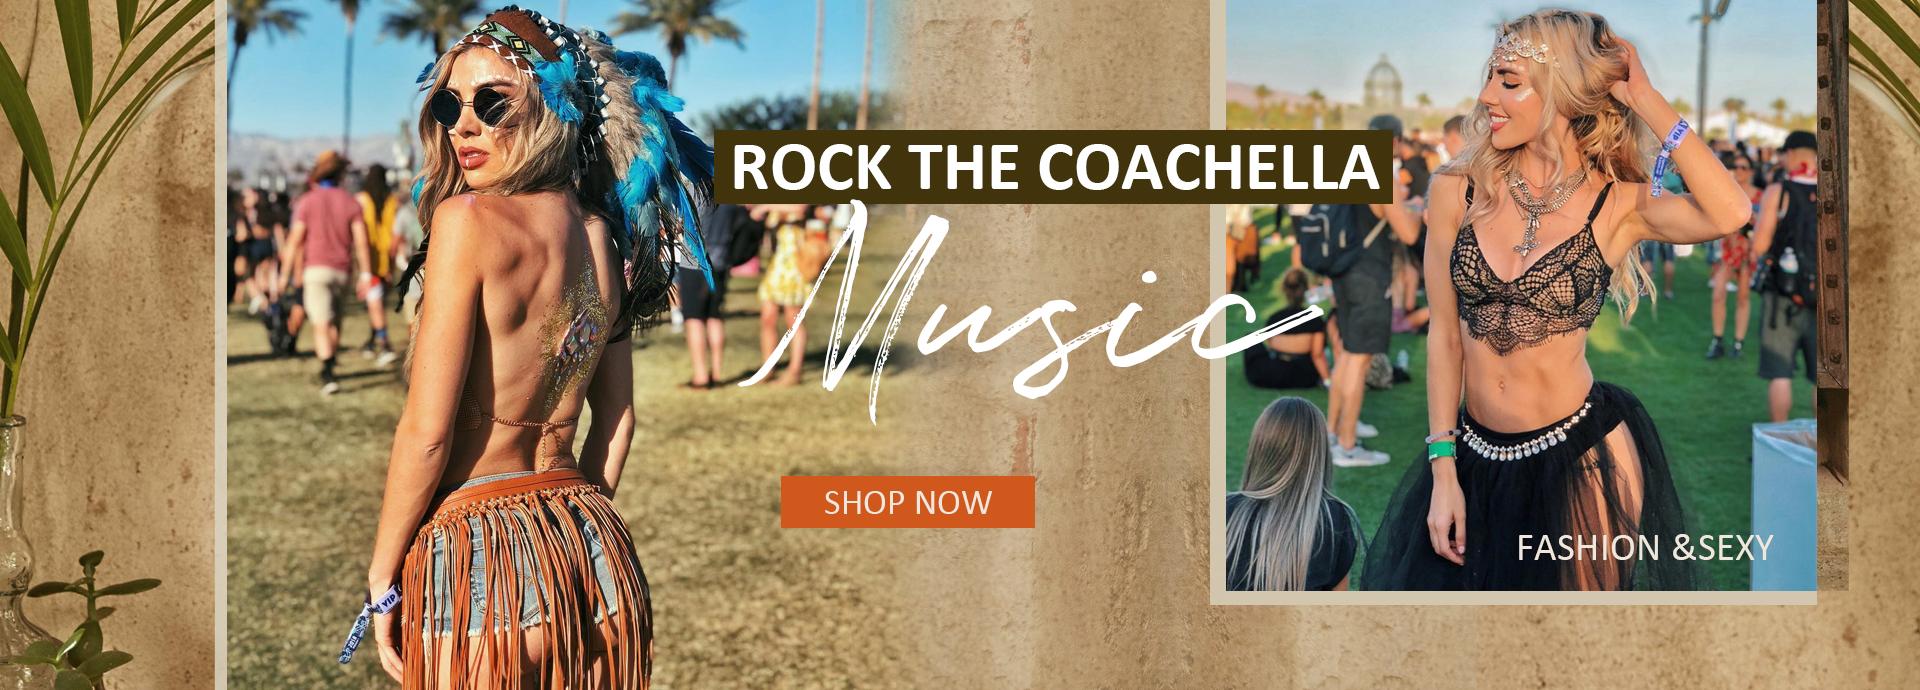 Rock the Coachella Music